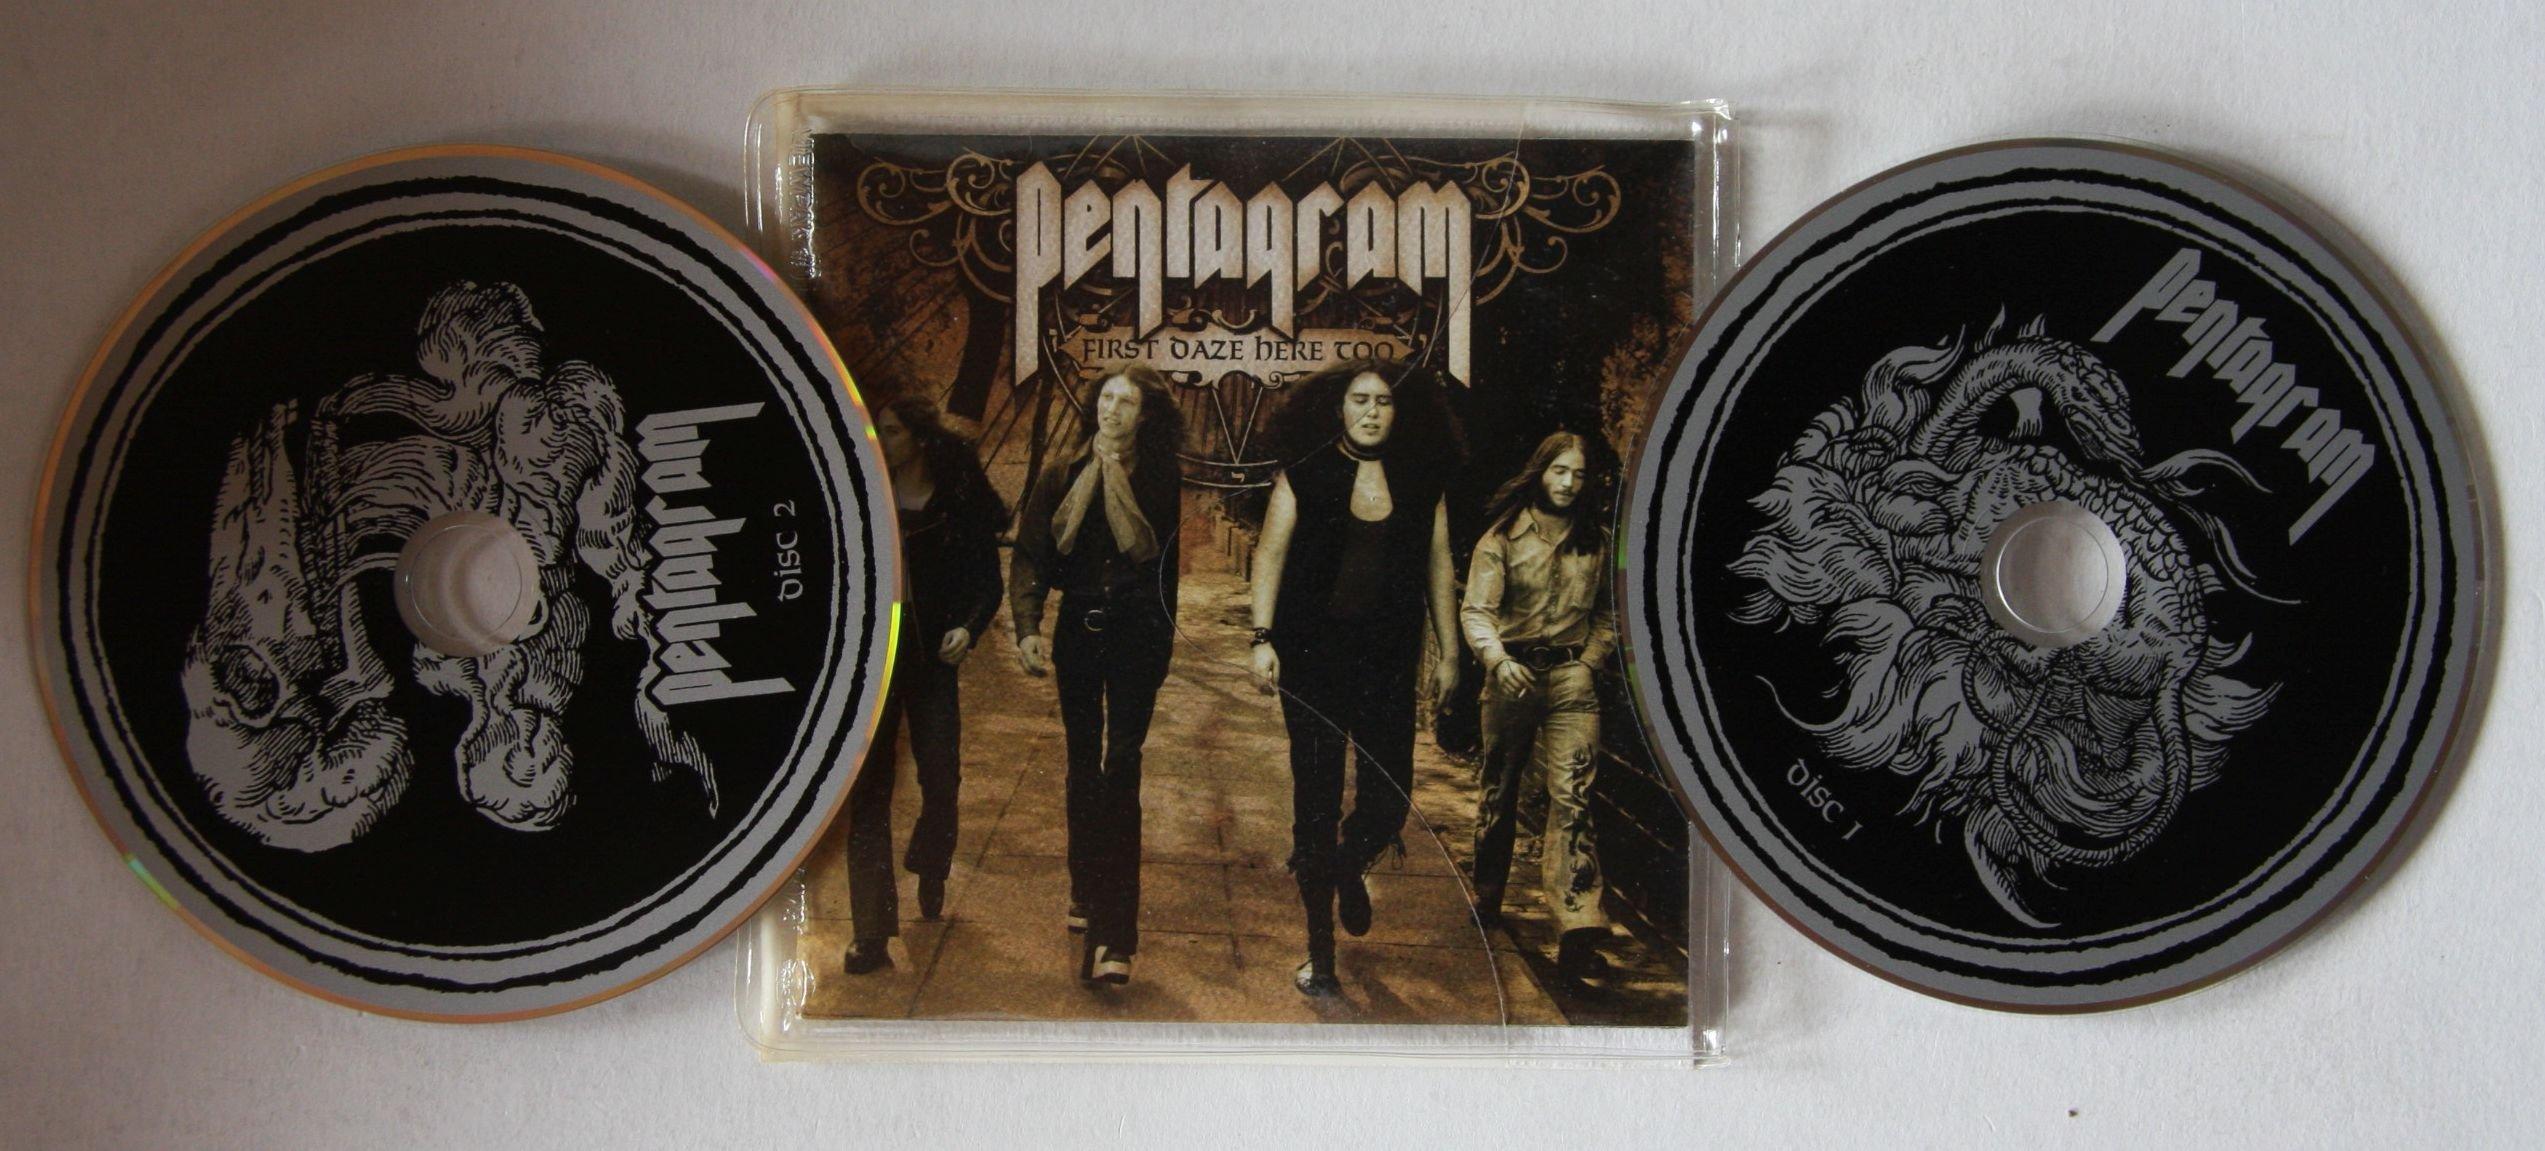 Pentagram First Daze Here Records Lps Vinyl And Cds